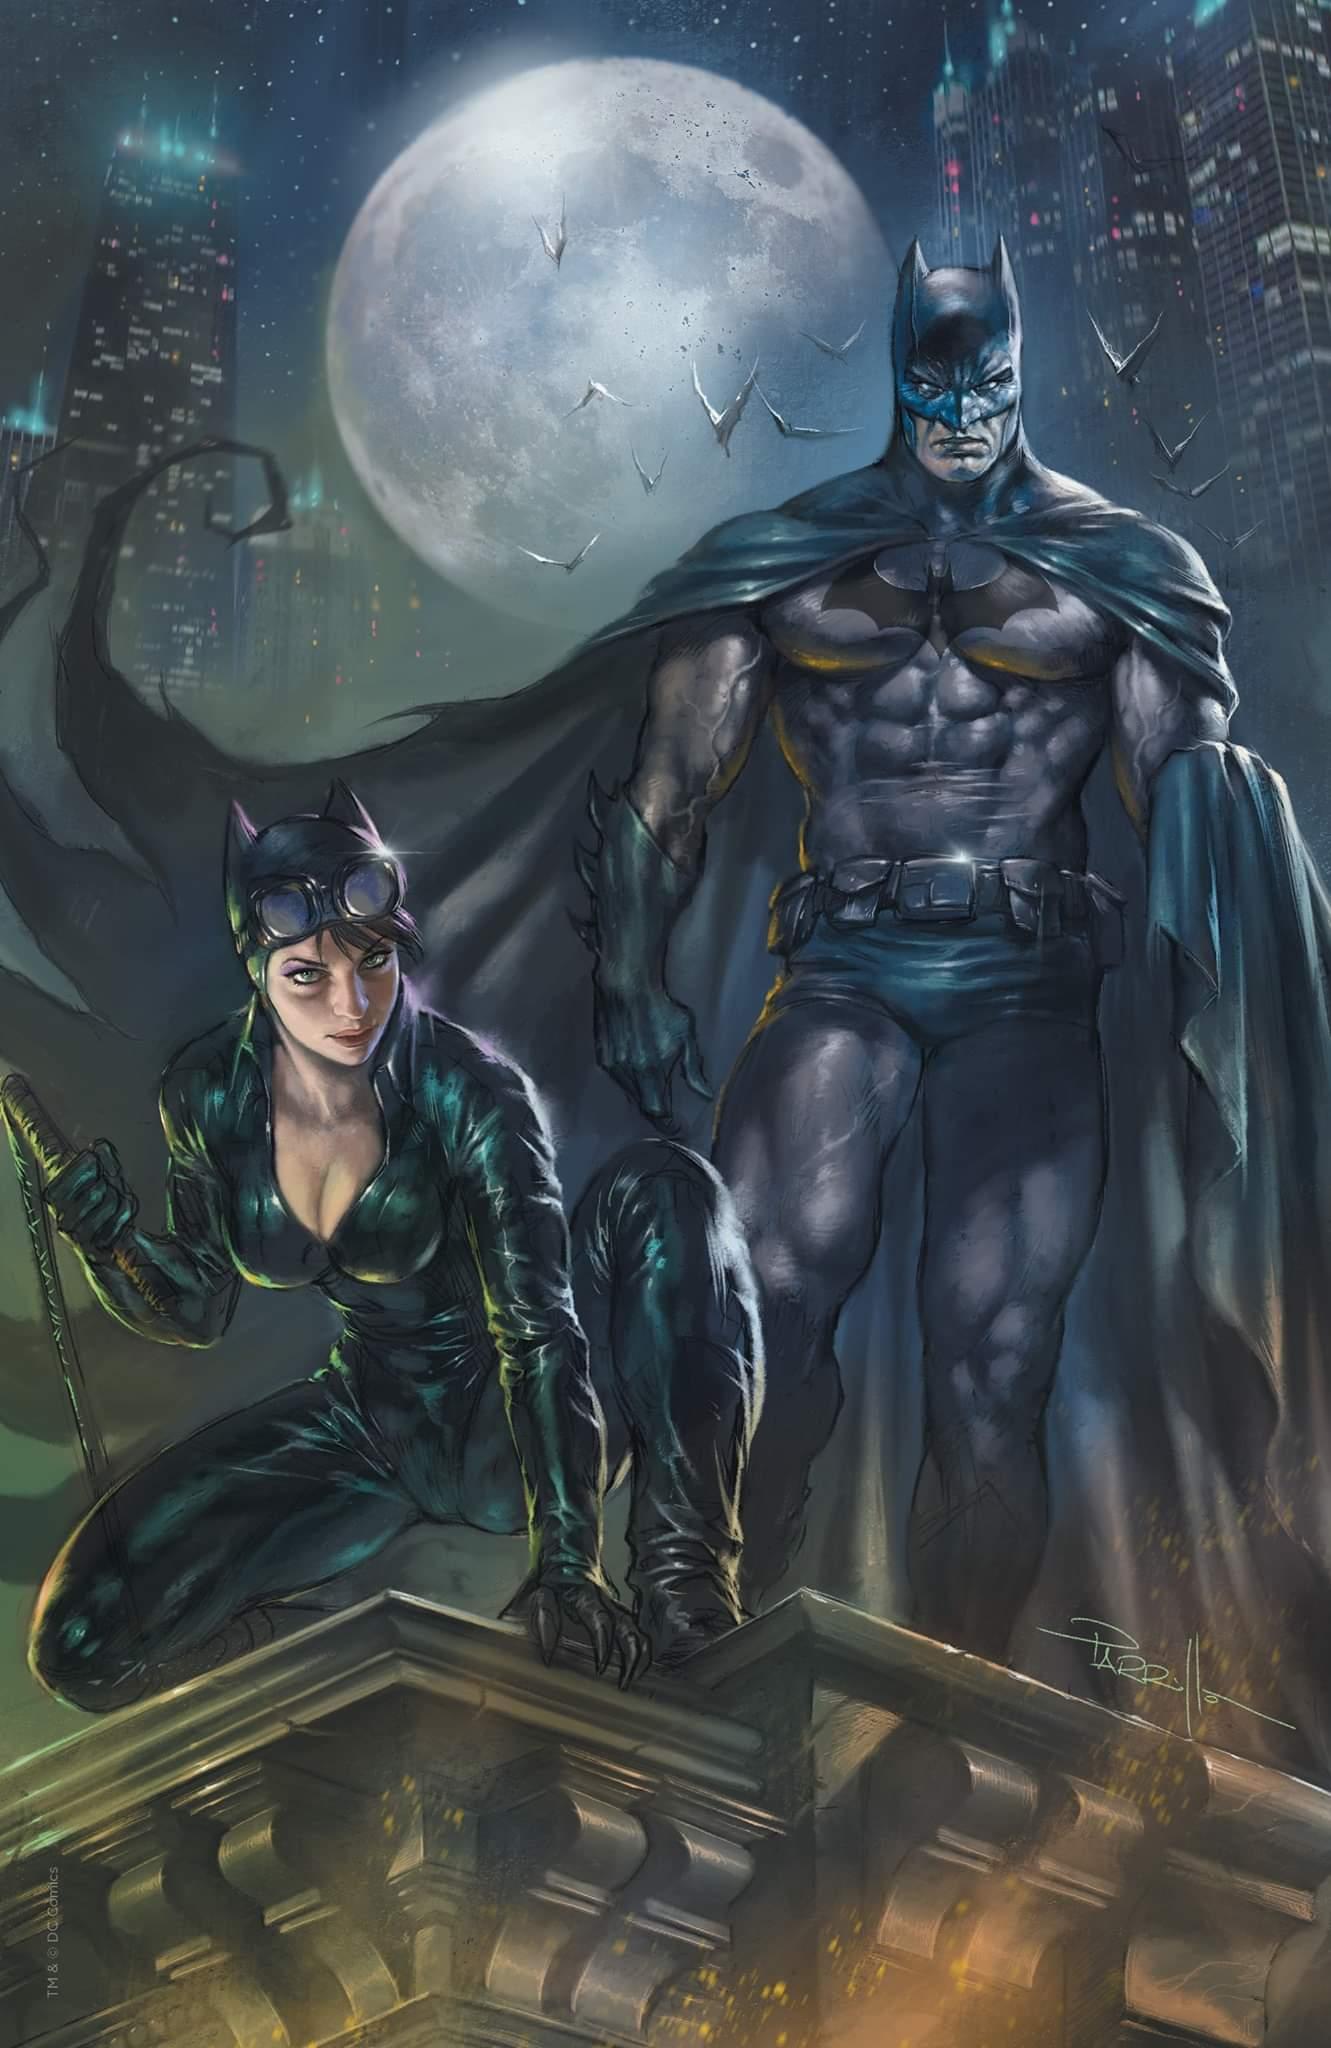 Batman Vol 3 100 Comics Elite Exclusive Lucio Parrillo Virgin Variant.jpg